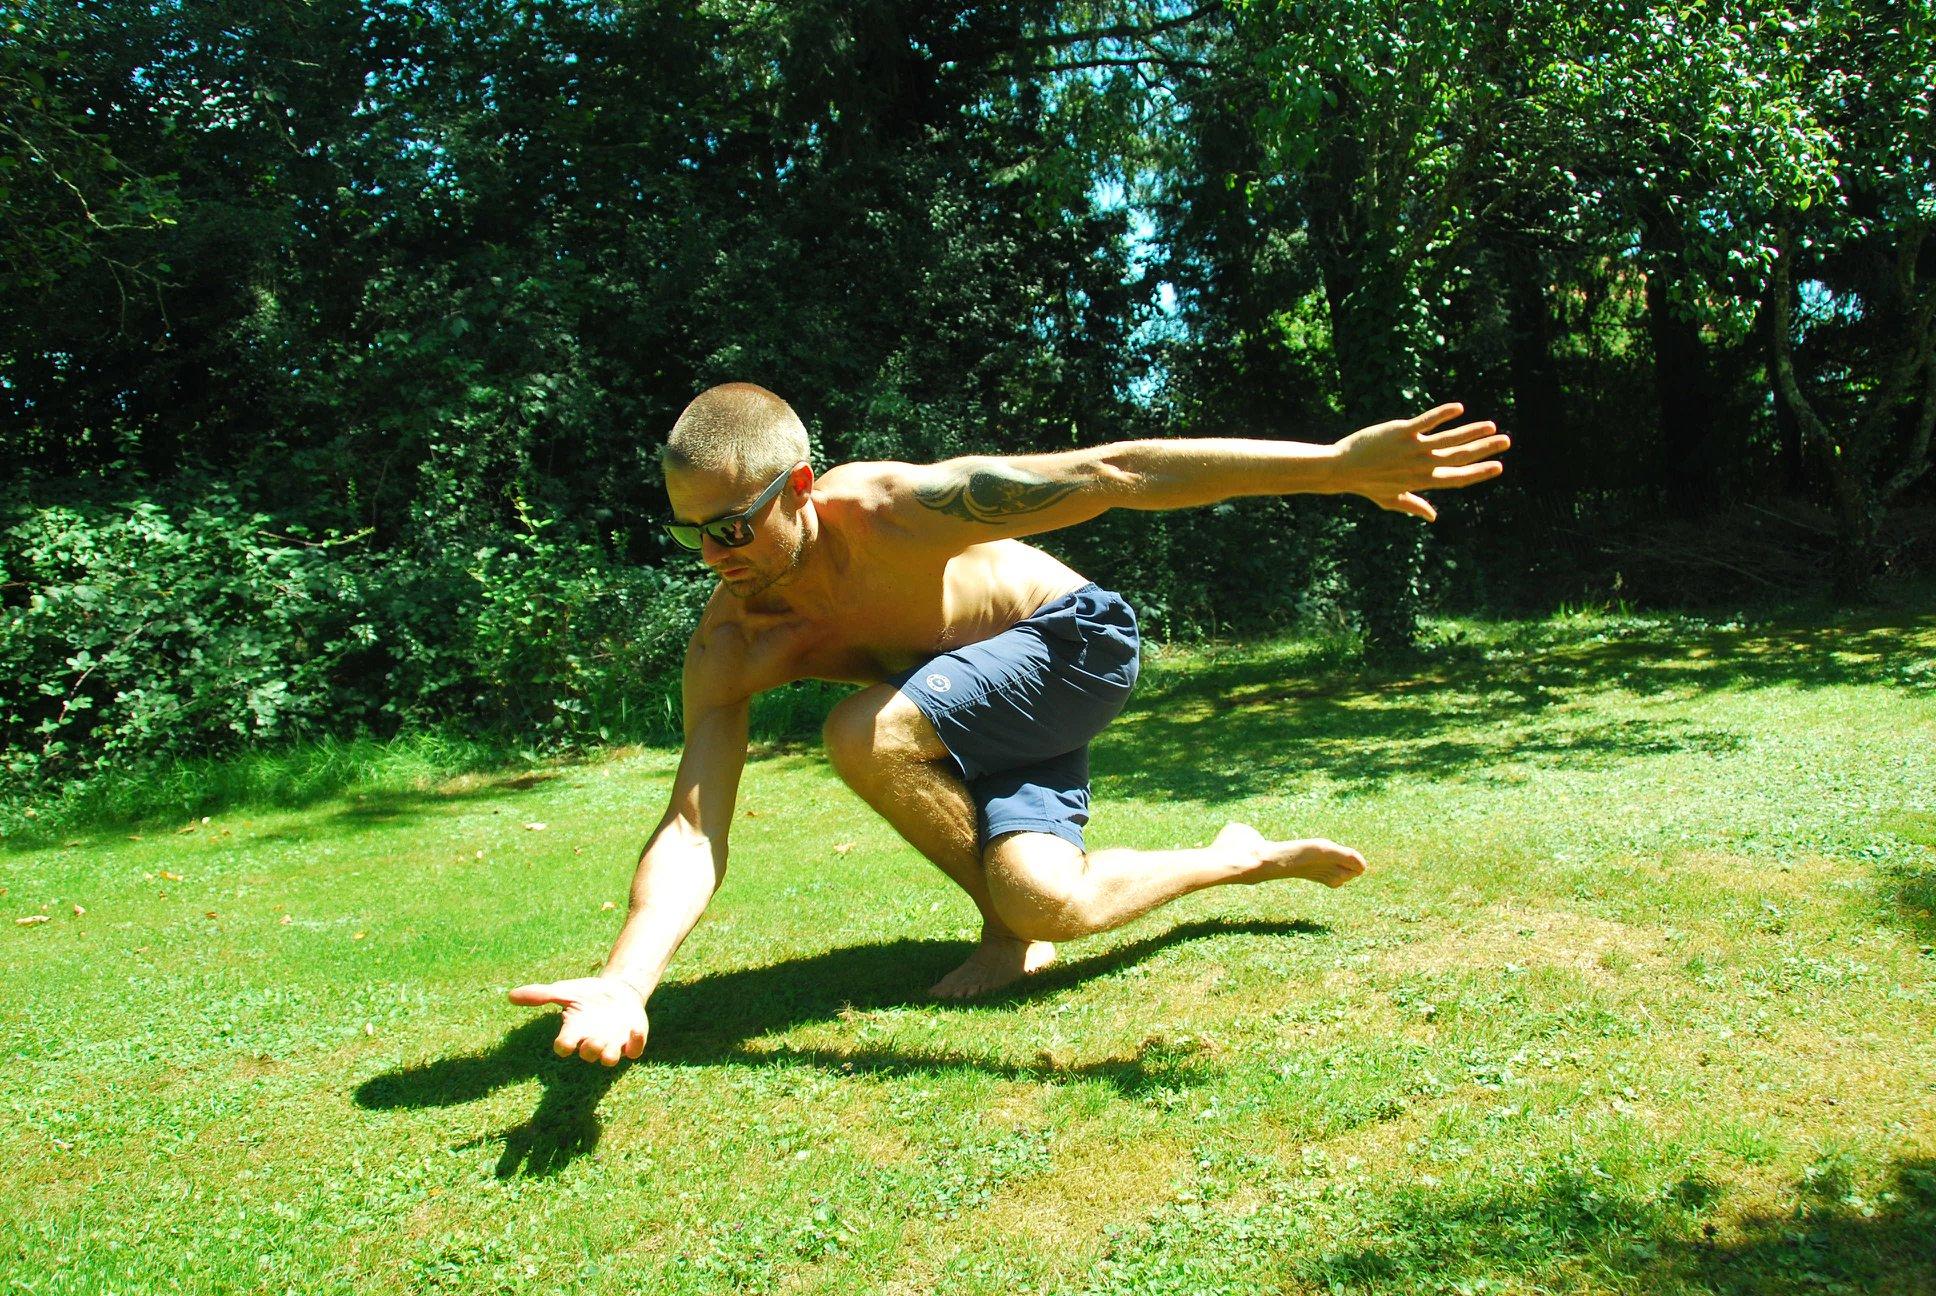 jd single leg image.jpg